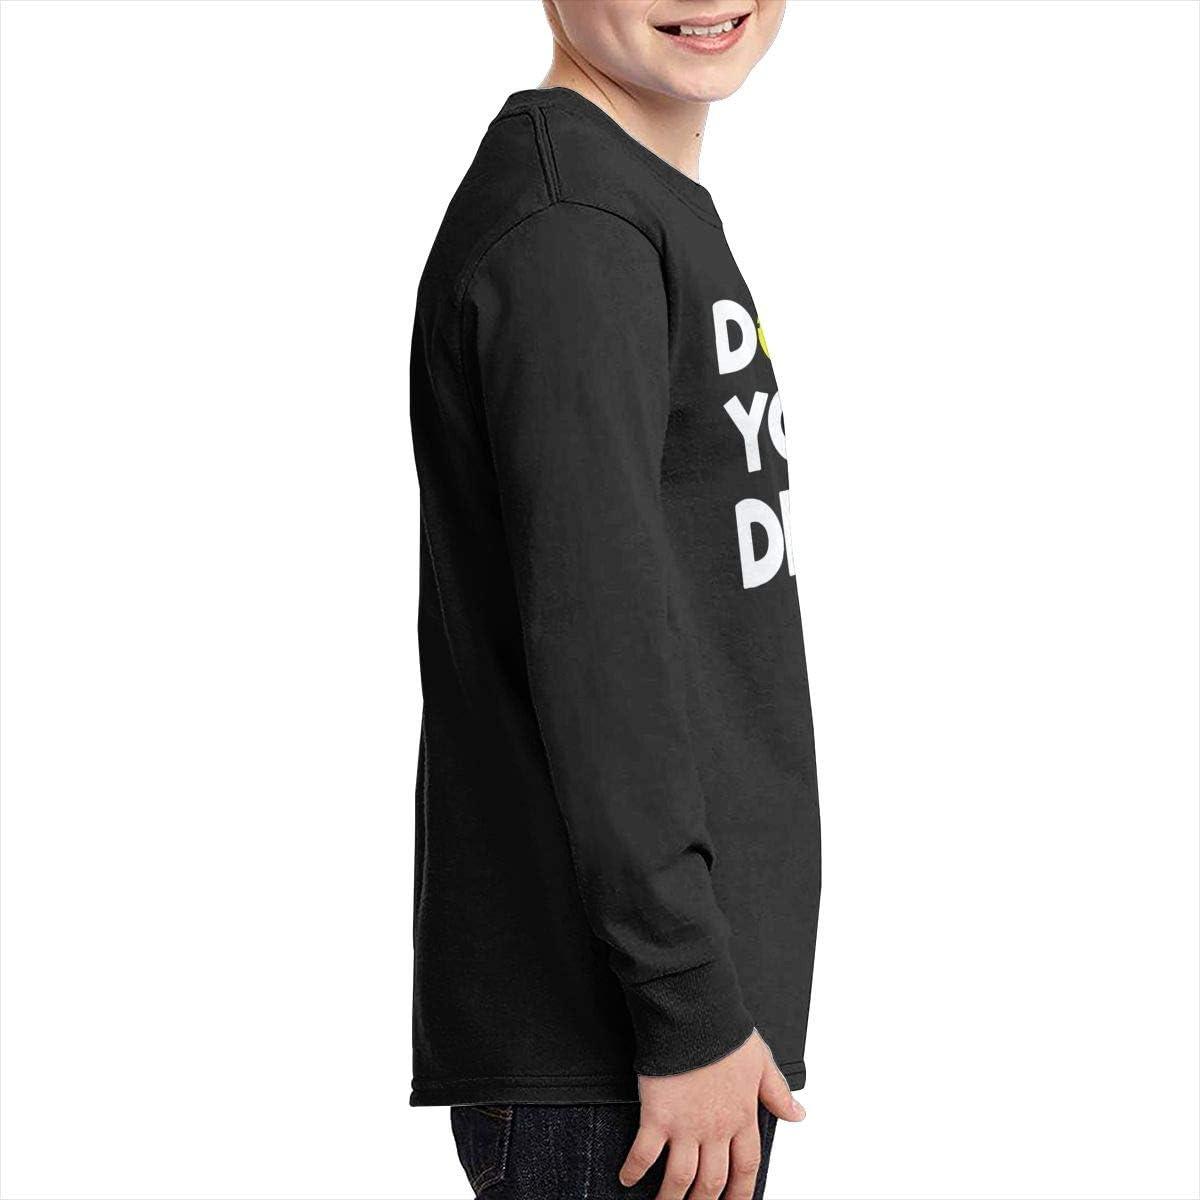 Teenagers Teen Girls Do You Dink Pickleball Printed Long Sleeve 100/% Cotton Tee Shirt